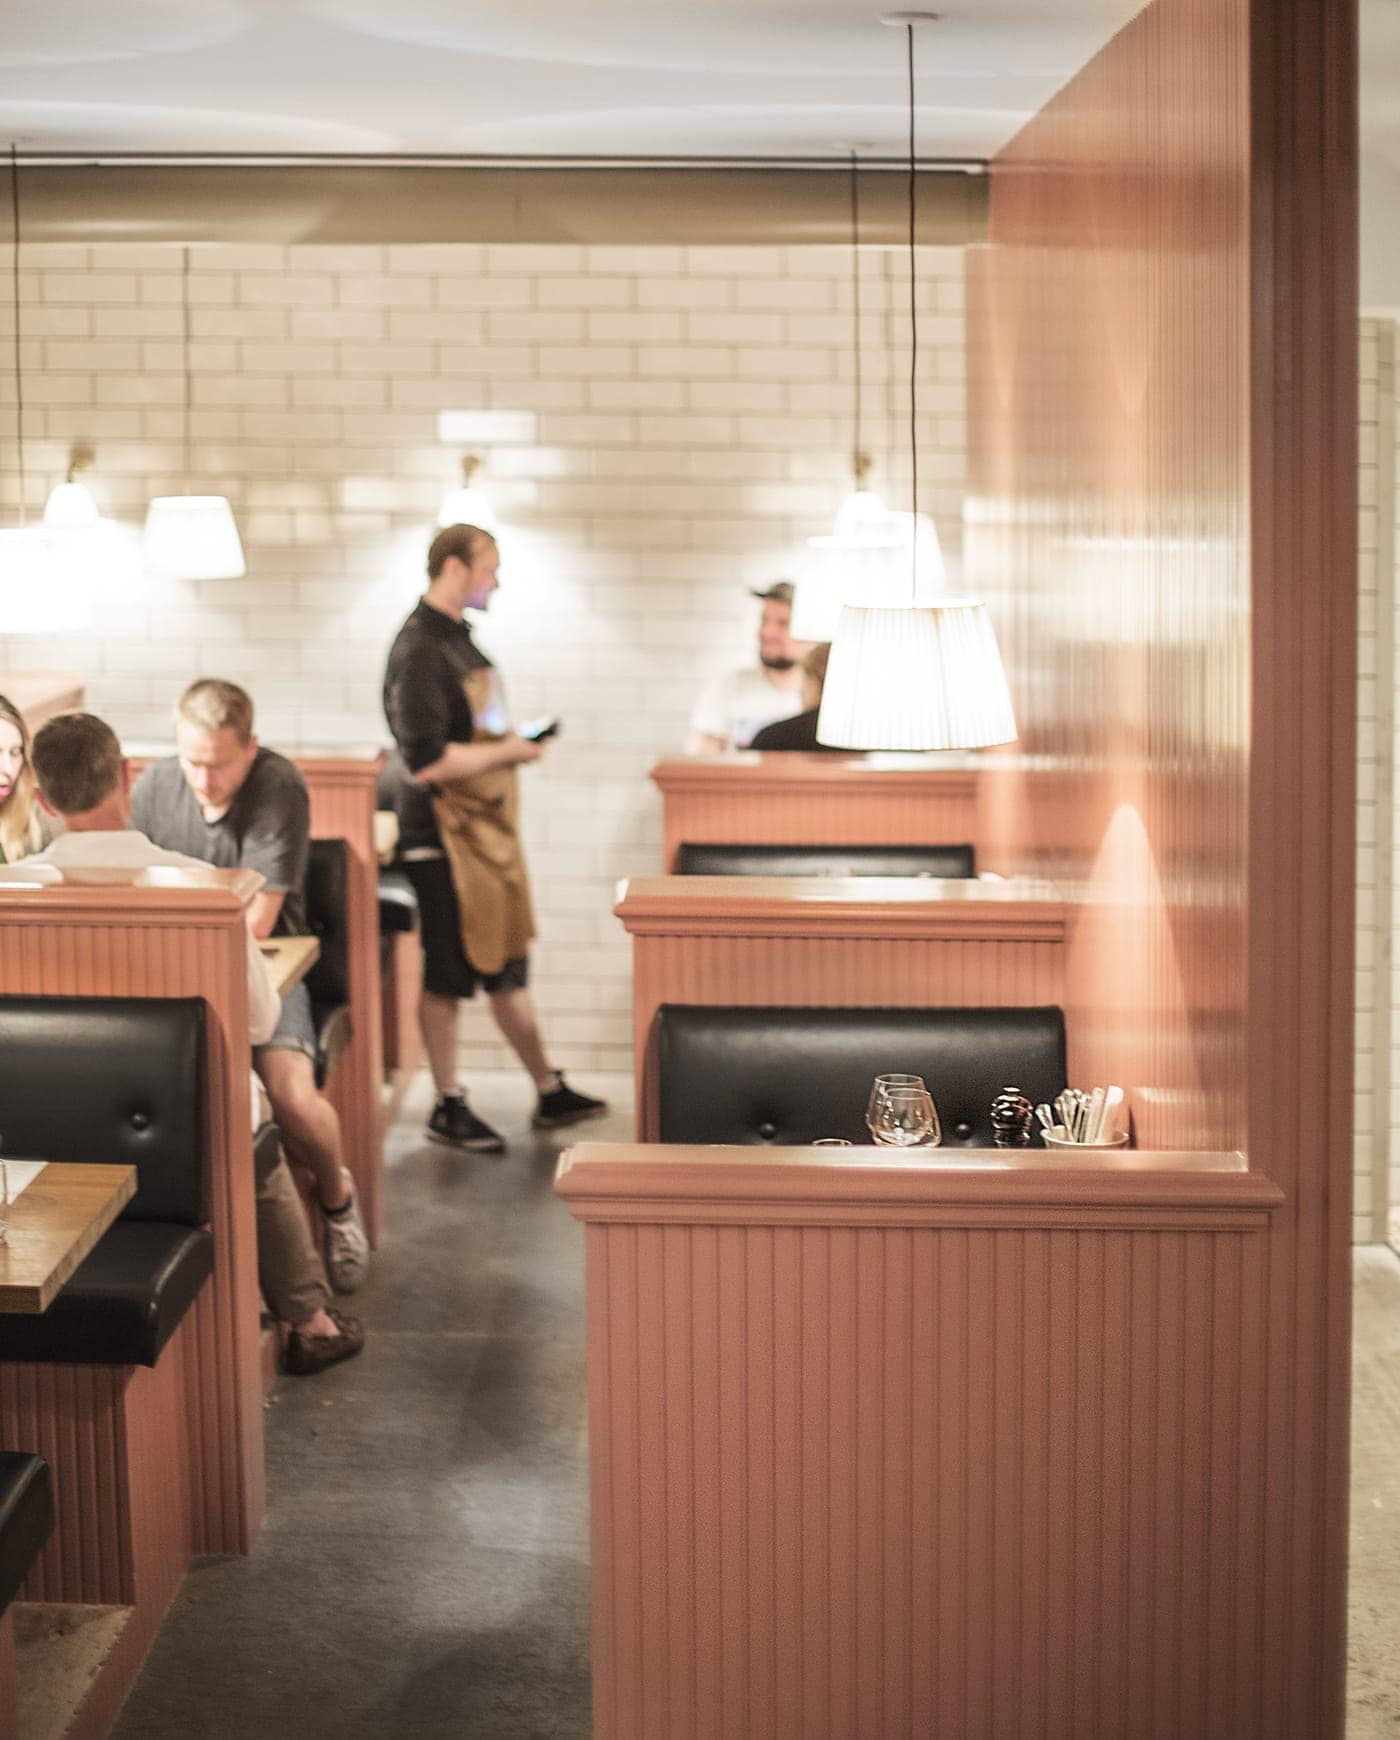 copenhagen-wanderlust-maklubben-restaurant